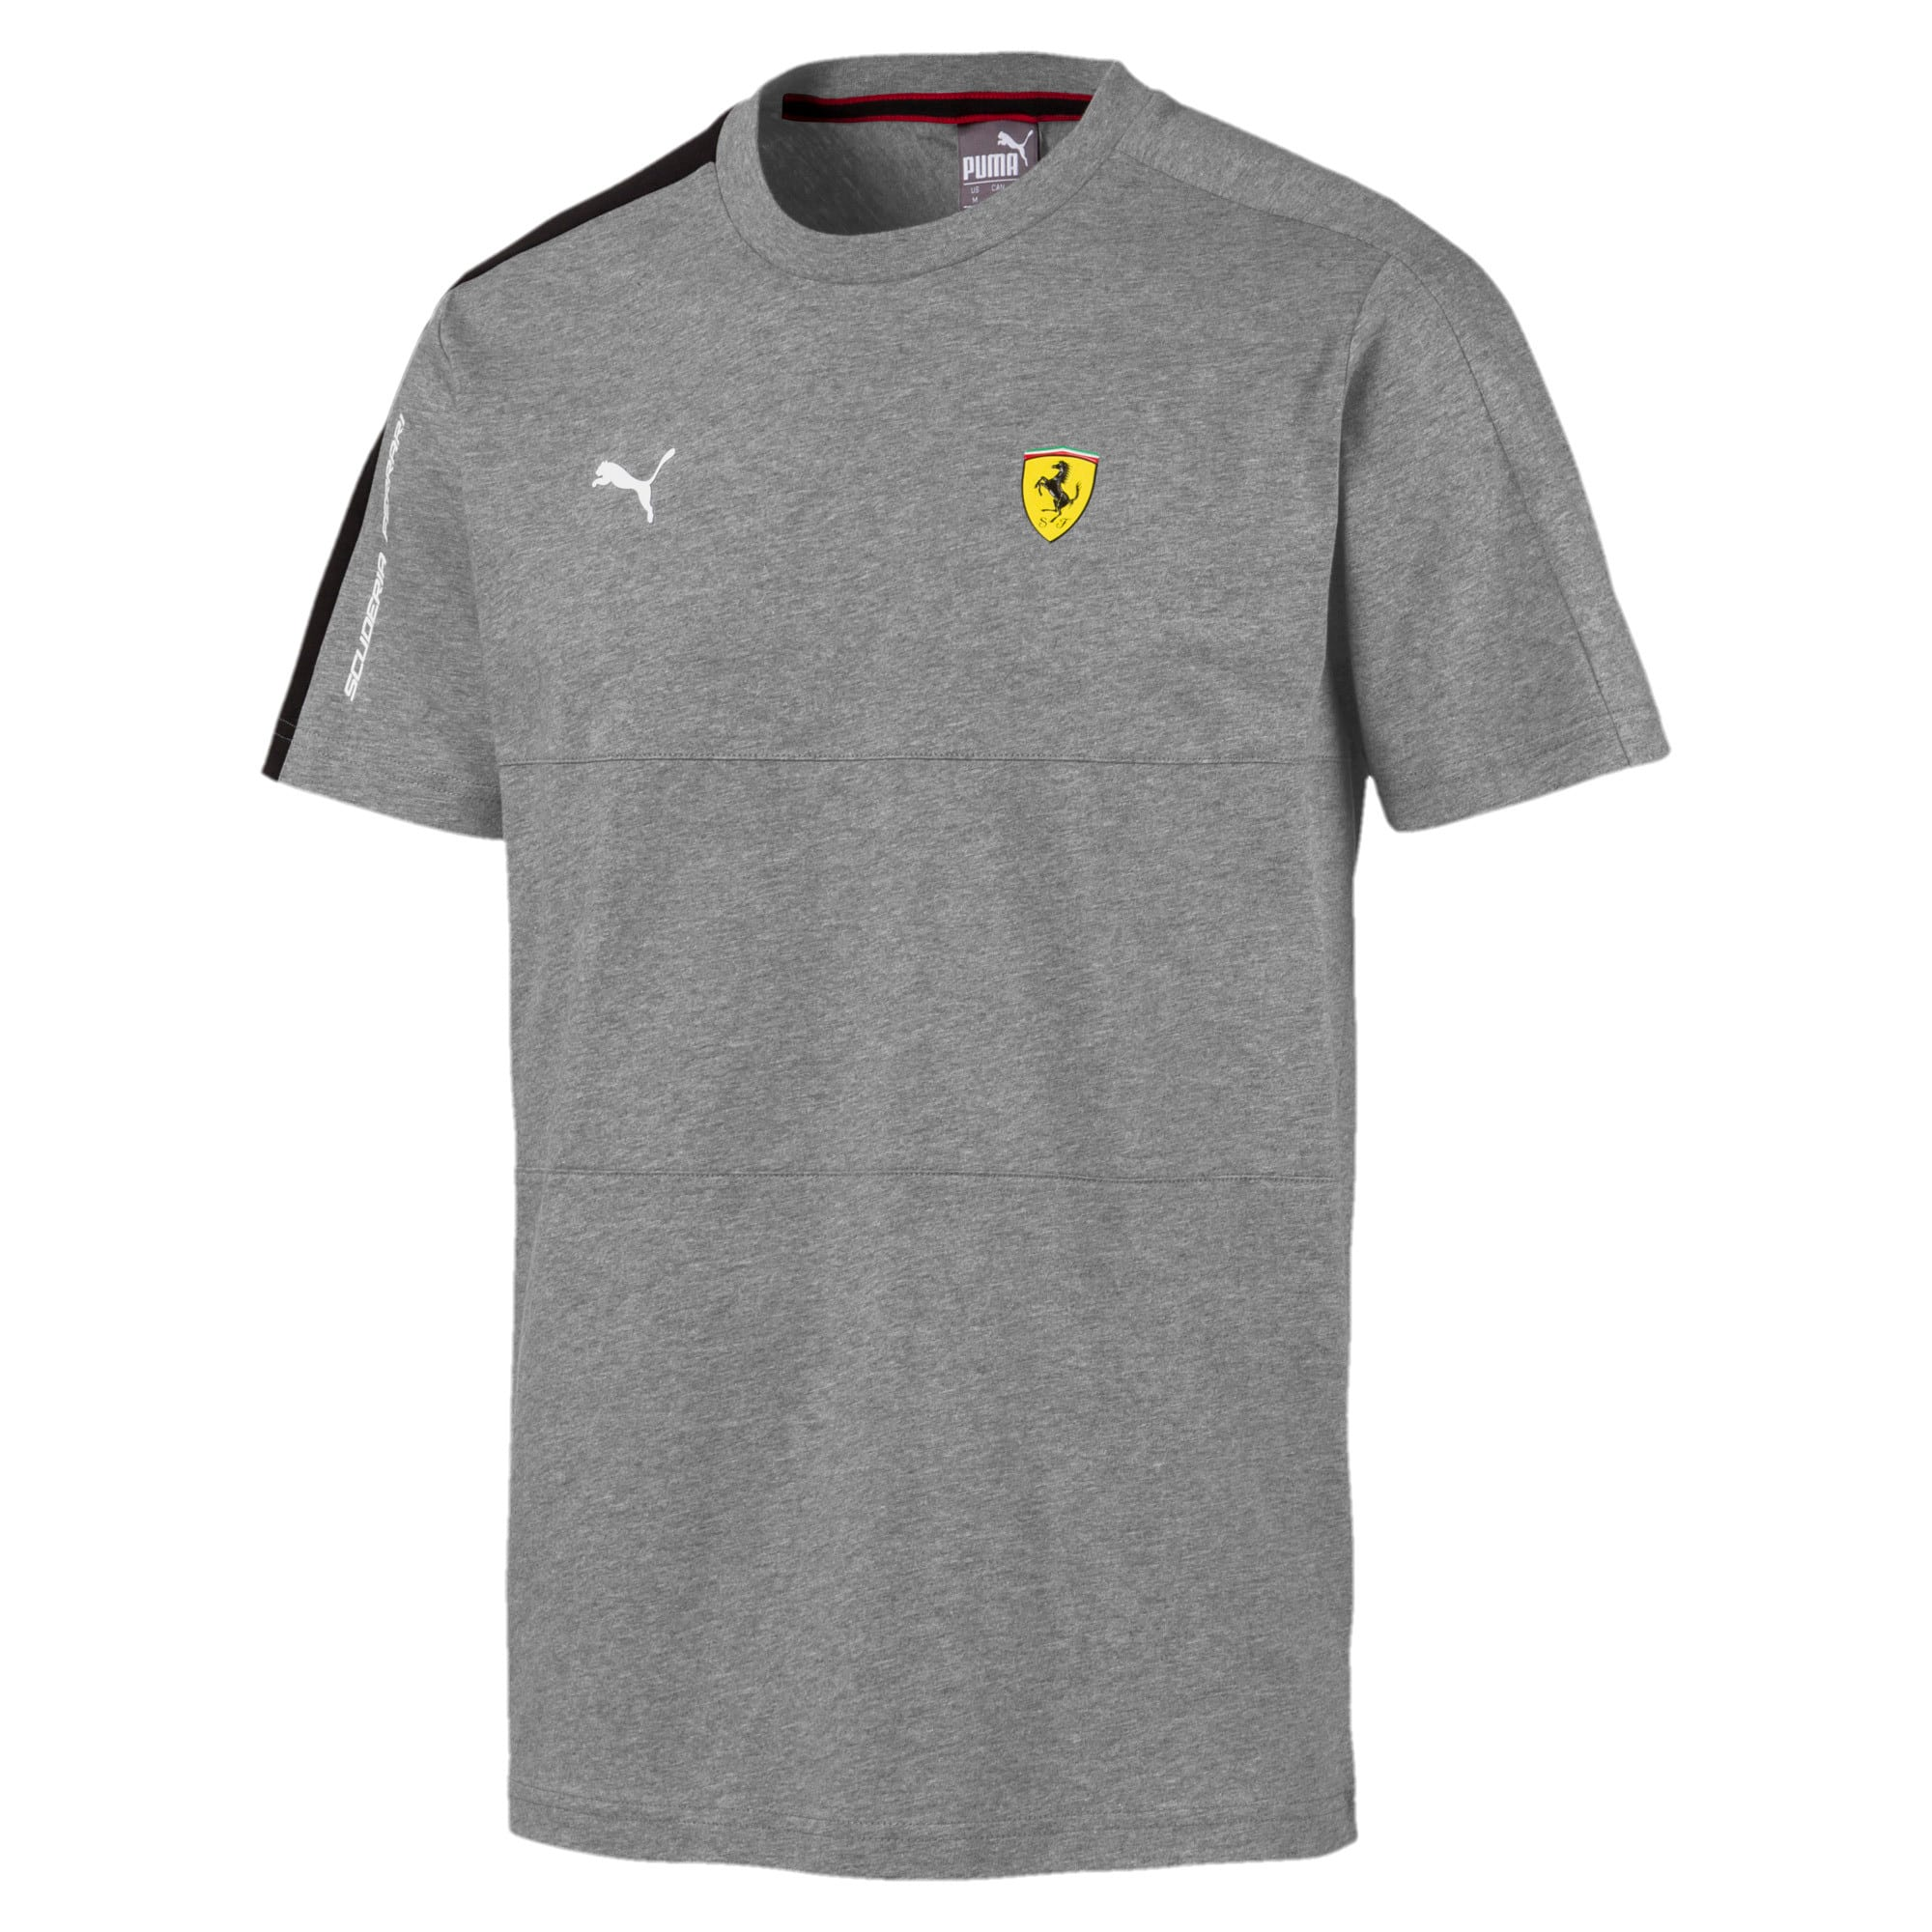 Thumbnail 4 of T-shirt Scuderia Ferrari T7 uomo, Medium Gray Heather, medium